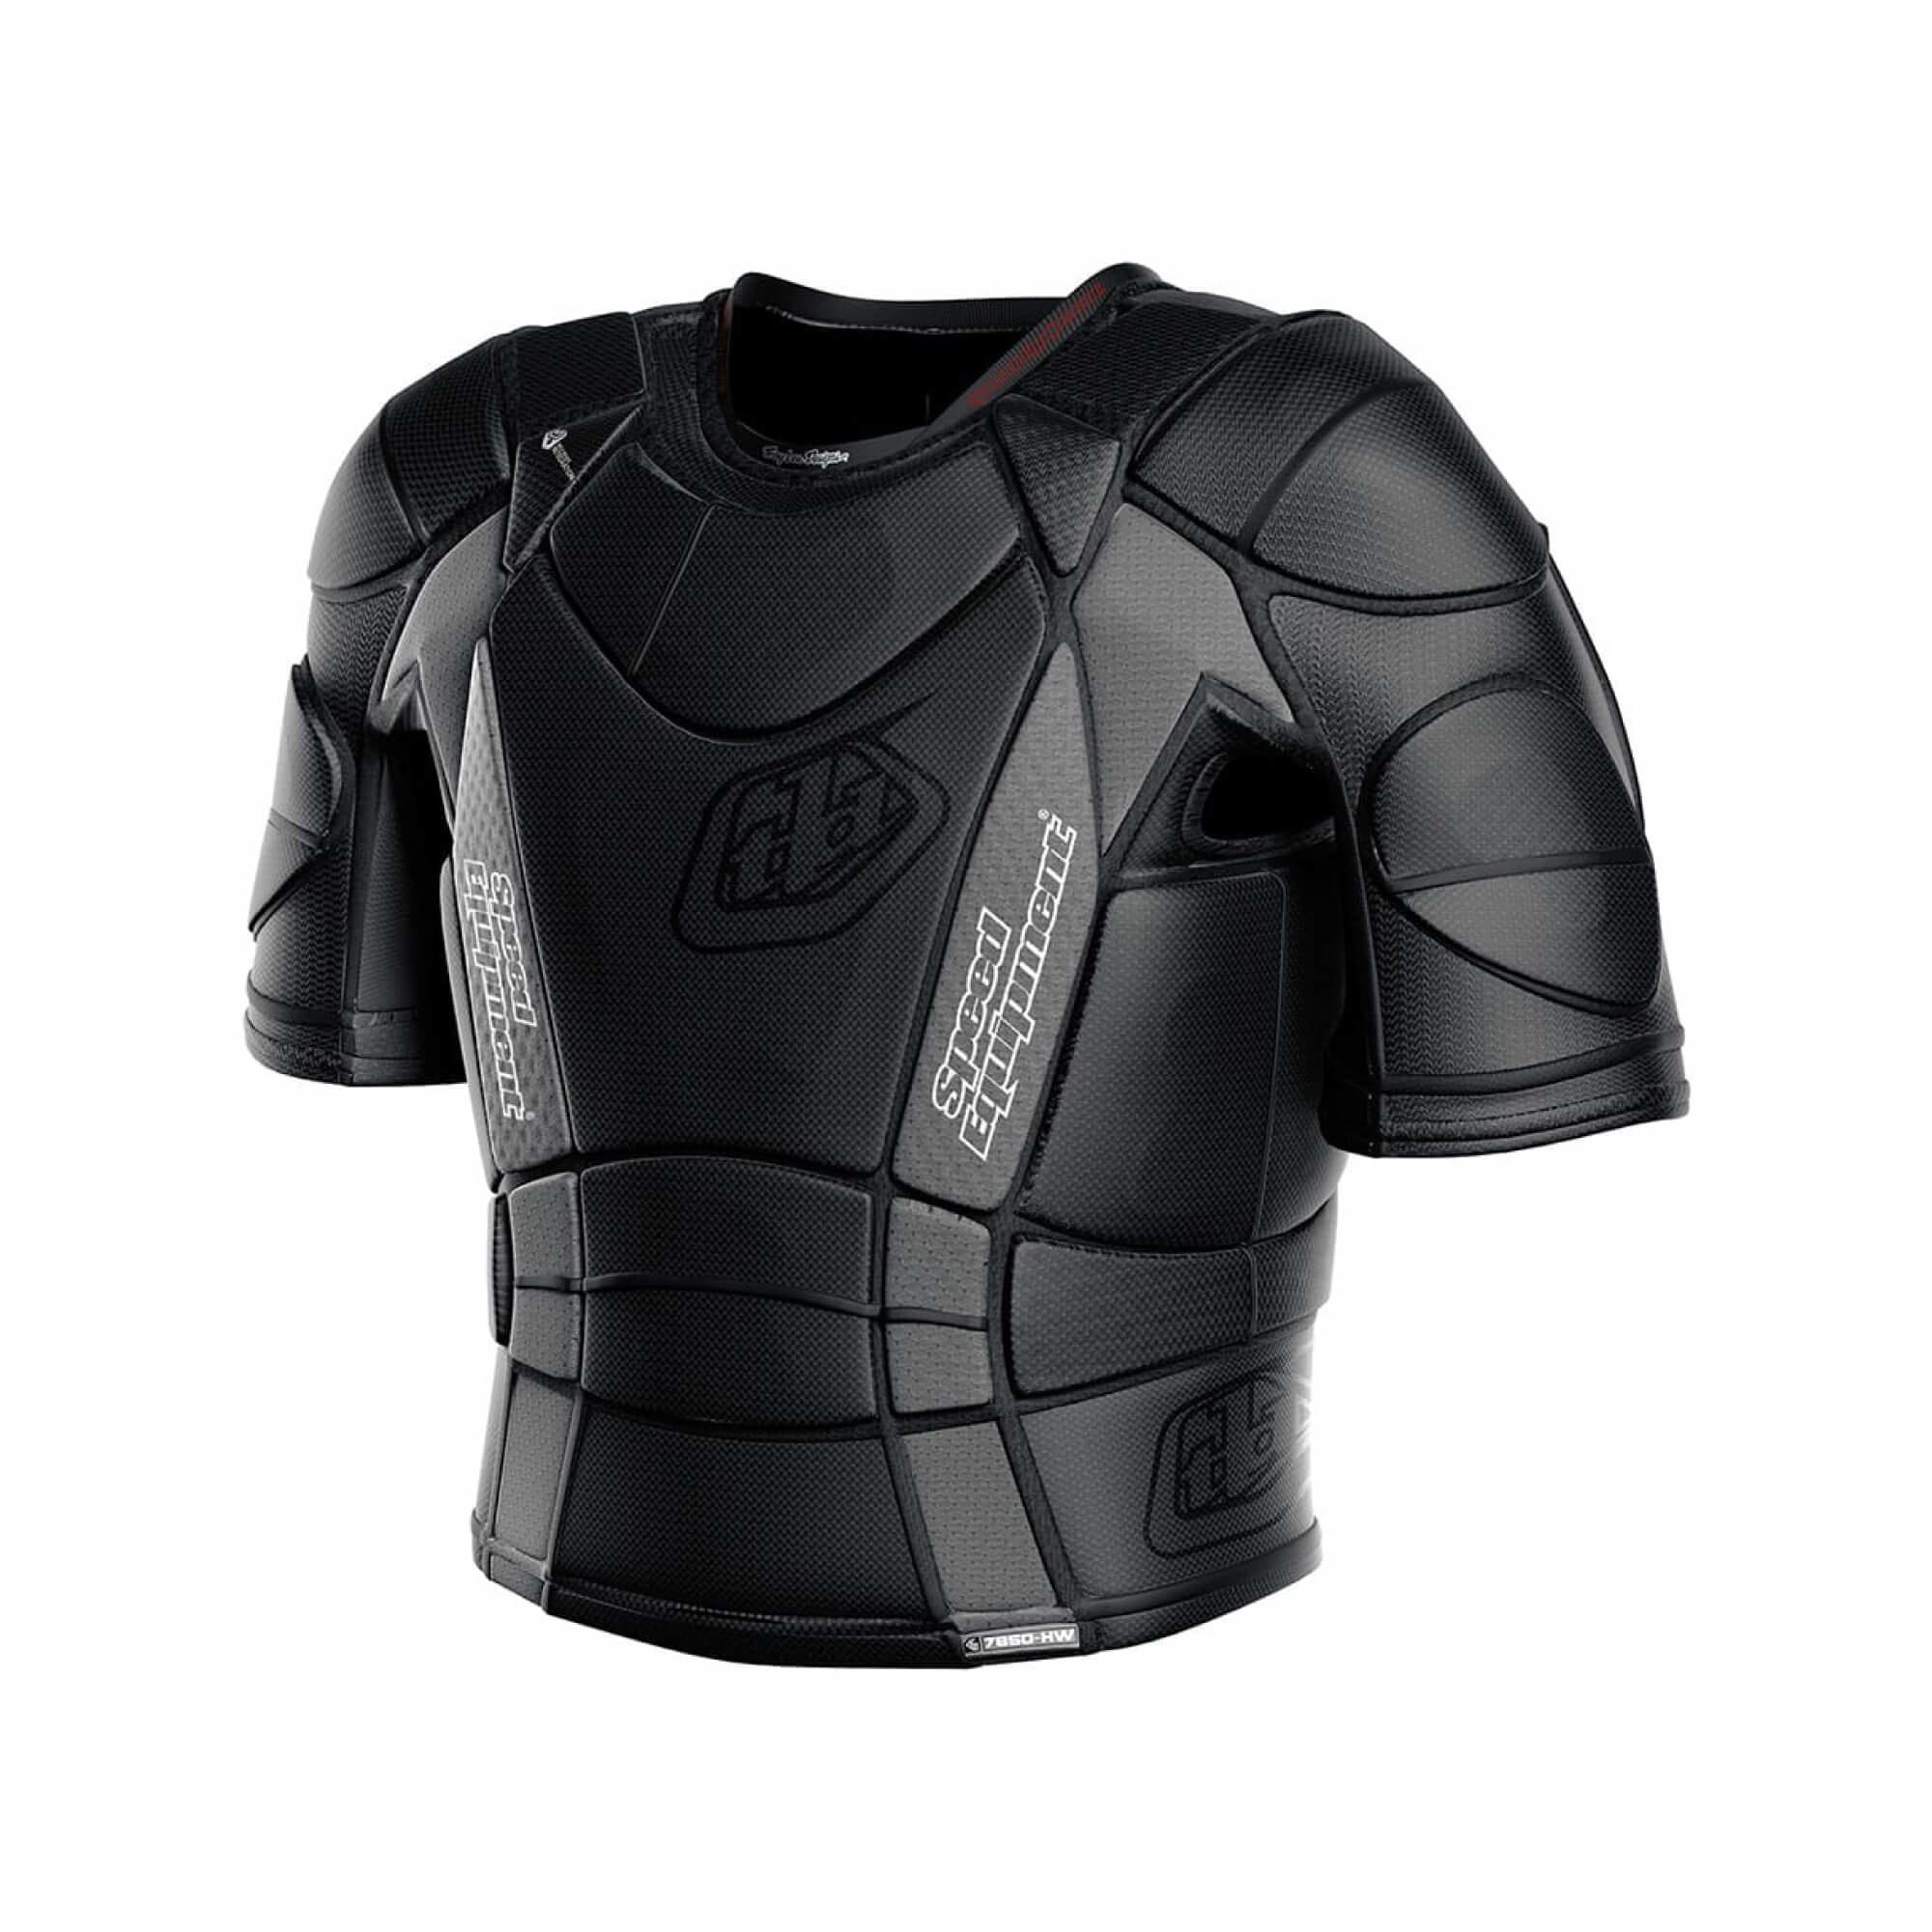 Upper Protection Shirt UPS 7850 Hot Weather Short Sleeve-1